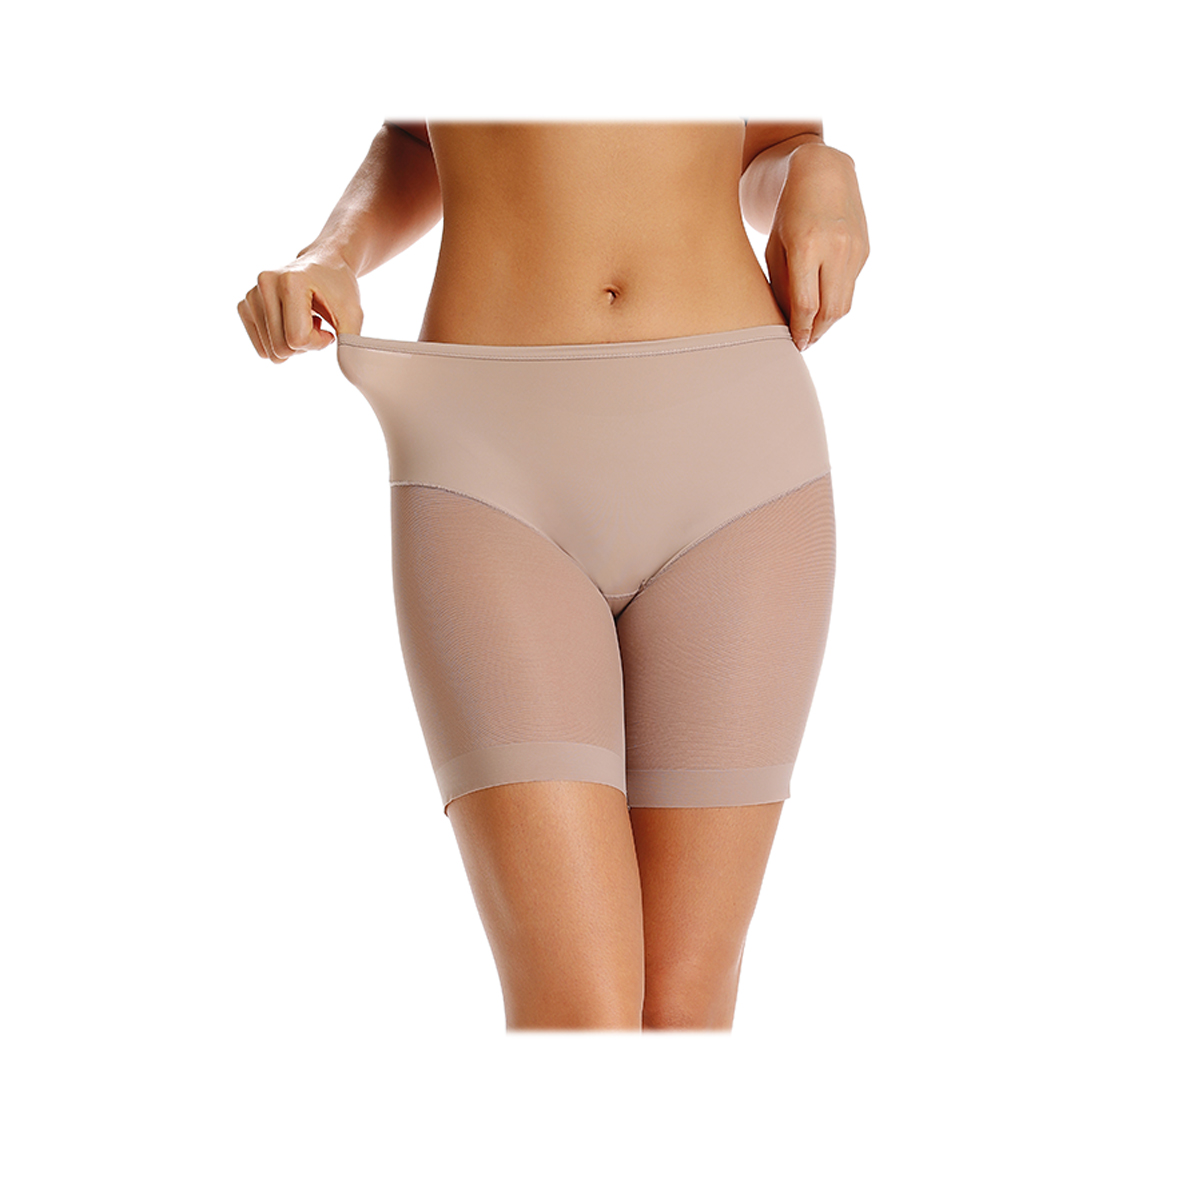 High Elastic Women Compression Control Panties Anti Chafing Lace Thigh Boyshorts